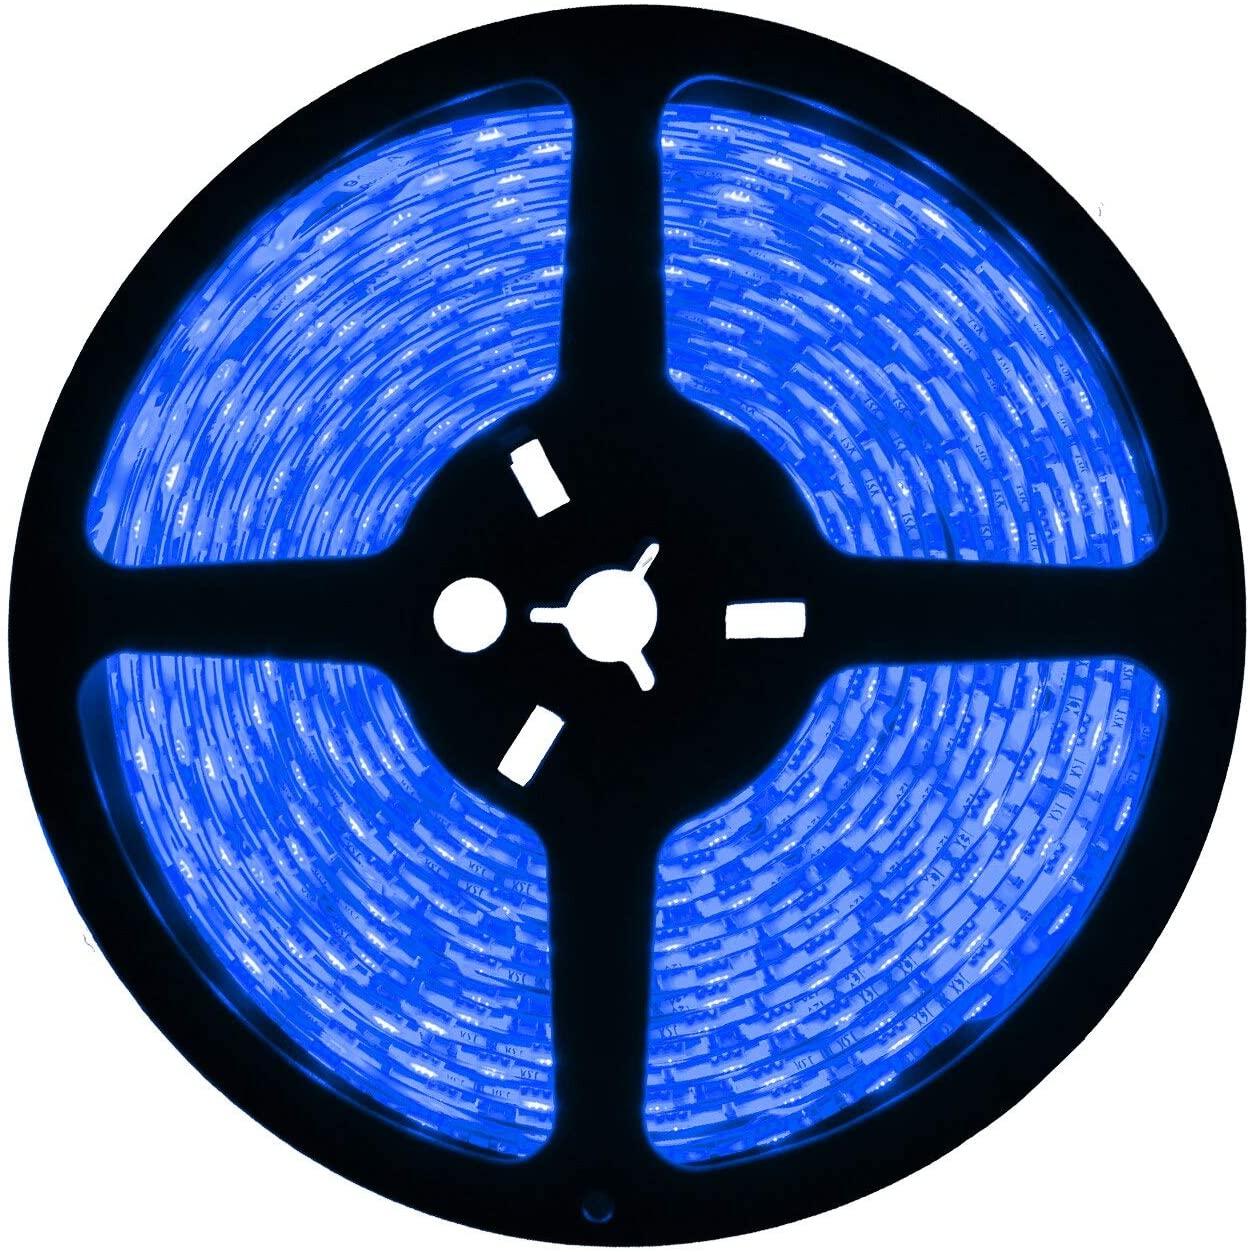 Brilliant Brand Lighting Blue LED Strip Light - 12 Volt - High Output (SMD 3528) - Indoor Use (IP22) - 16.4 Feet